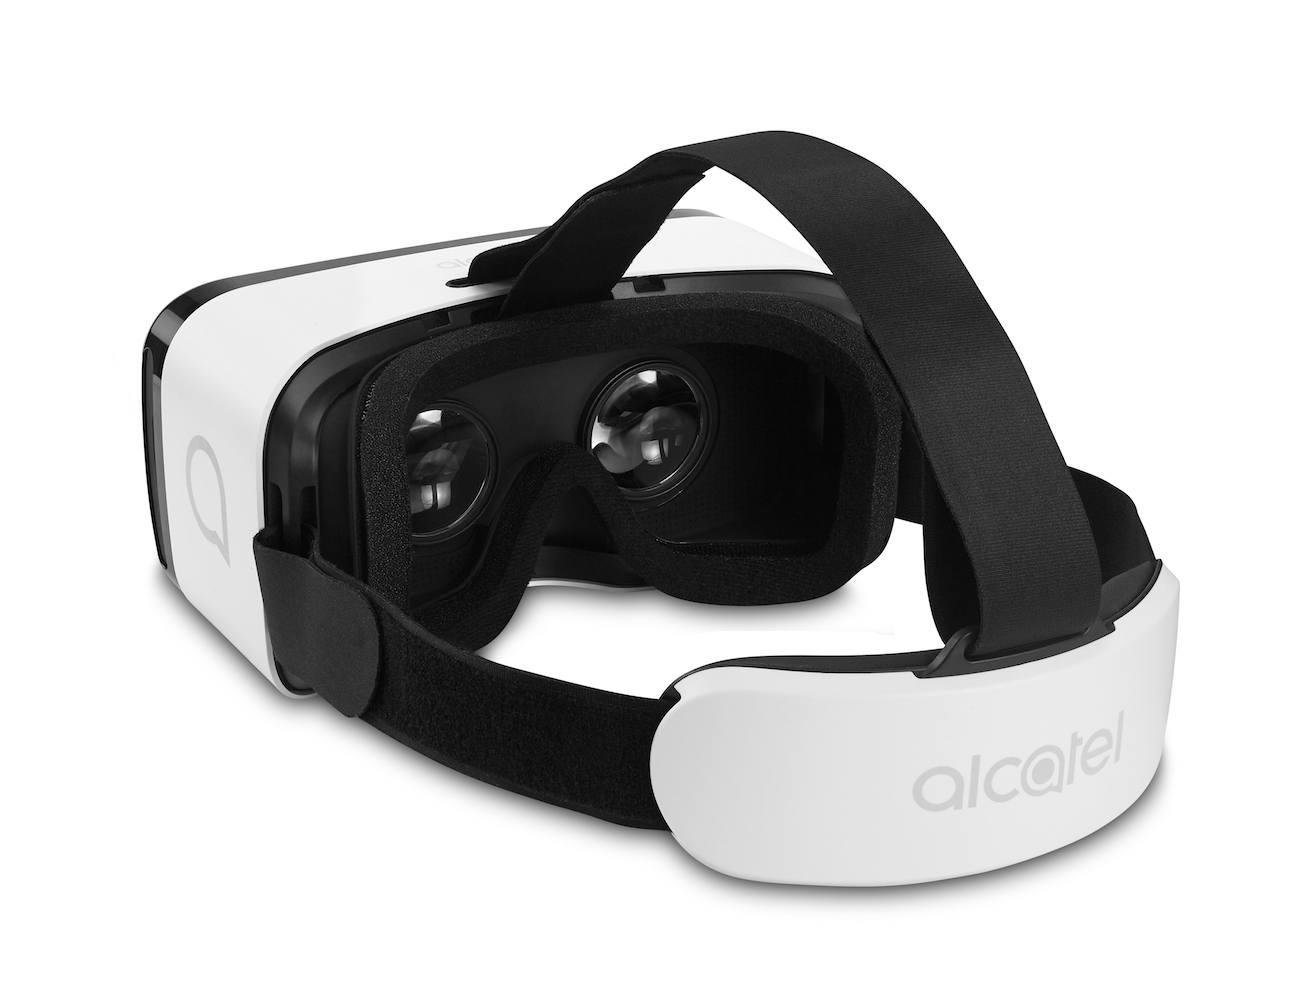 IDOL 4S Smartphone VR Headset